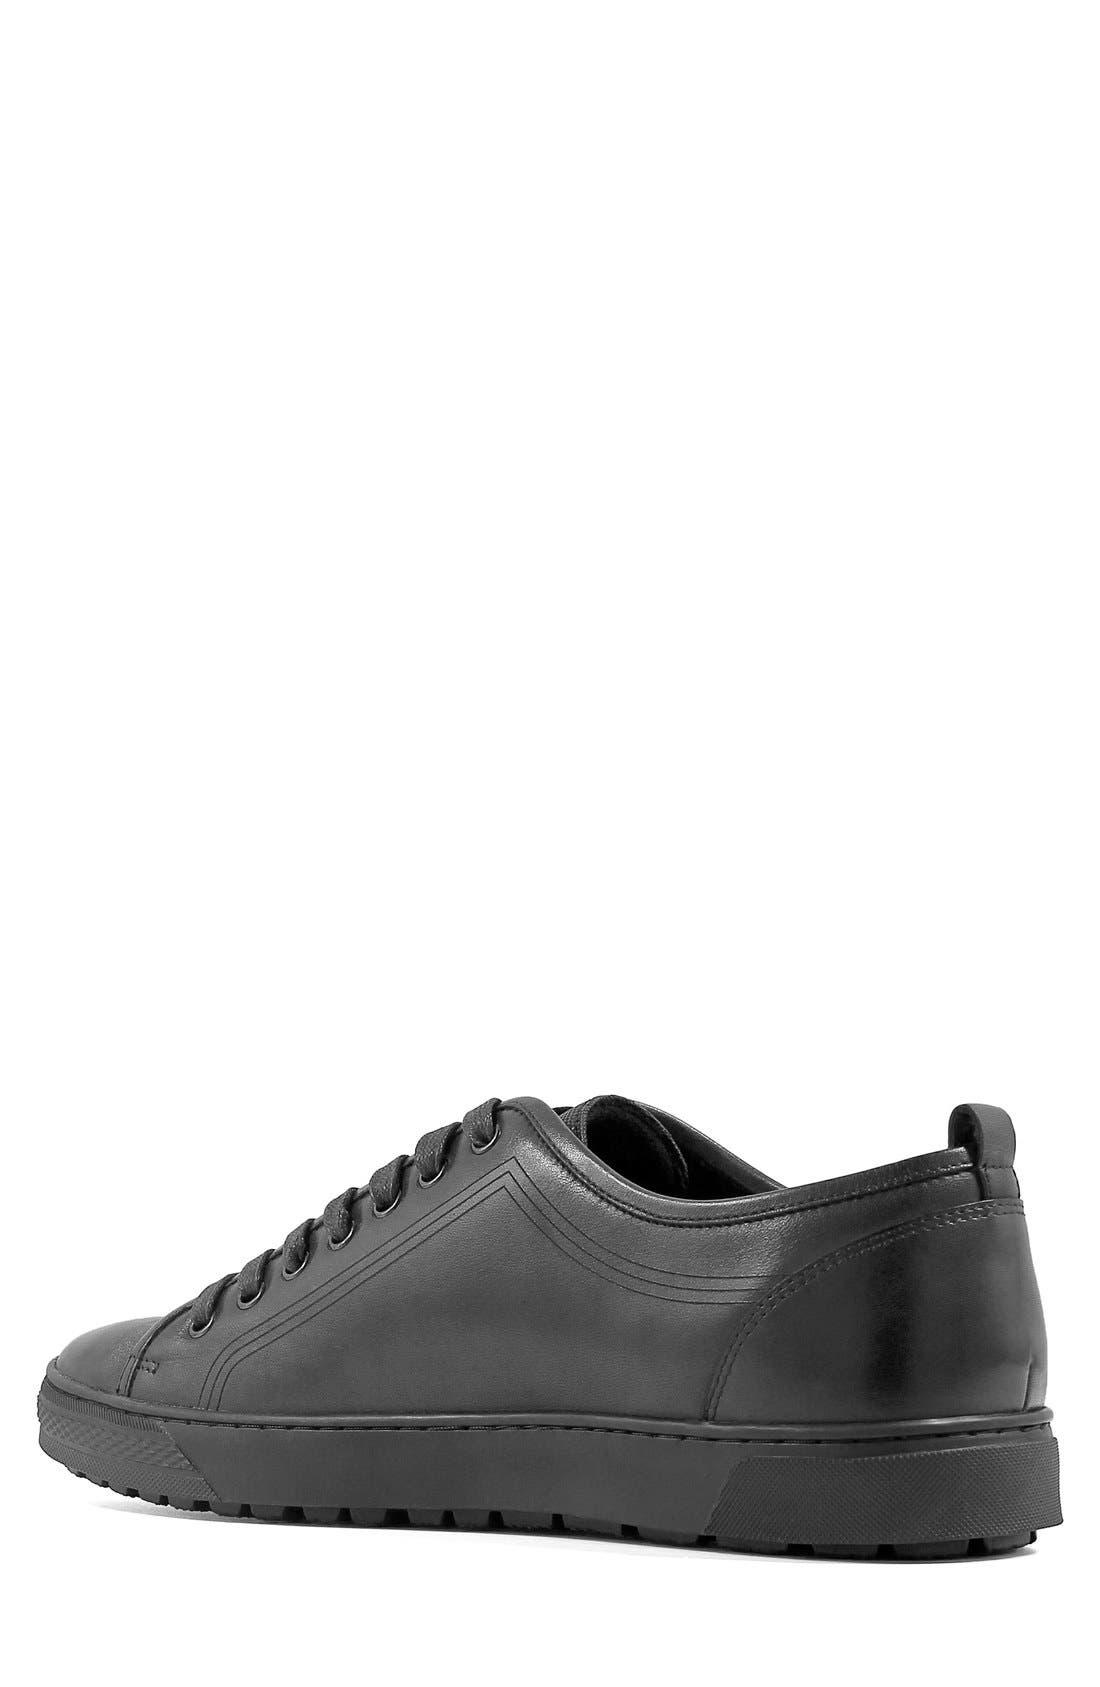 Forward Lo Sneaker,                             Alternate thumbnail 9, color,